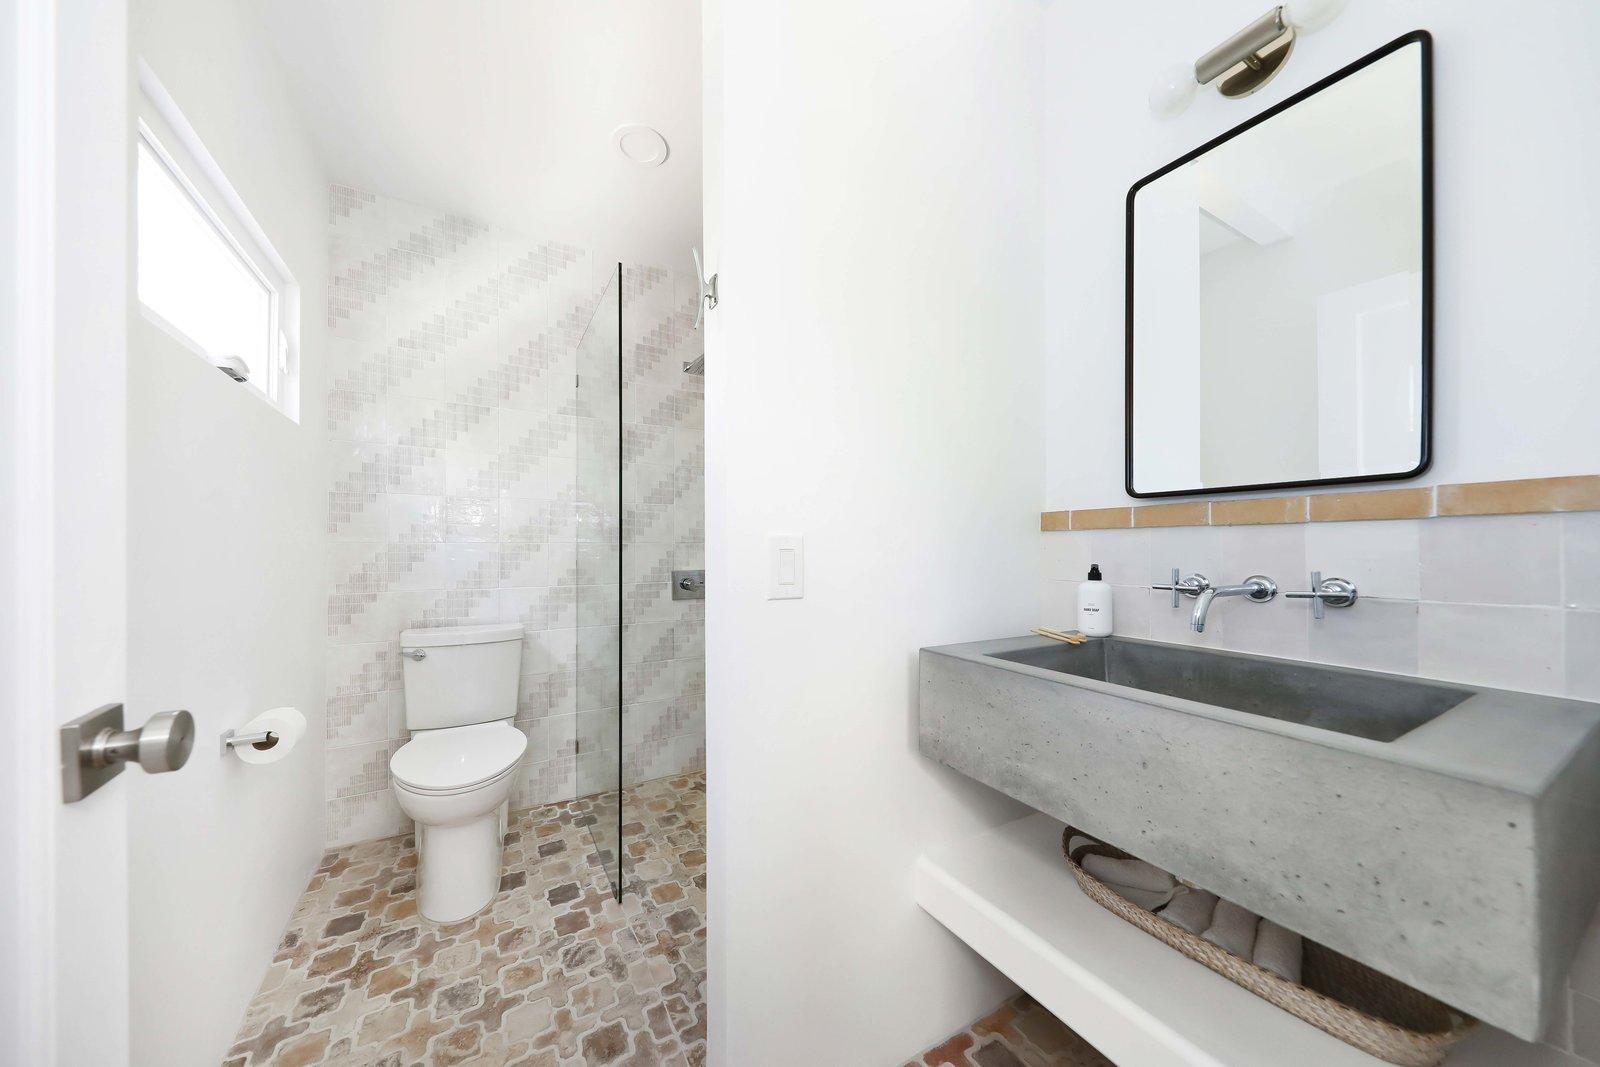 Los Angeles Spanish Bungalow bathroom